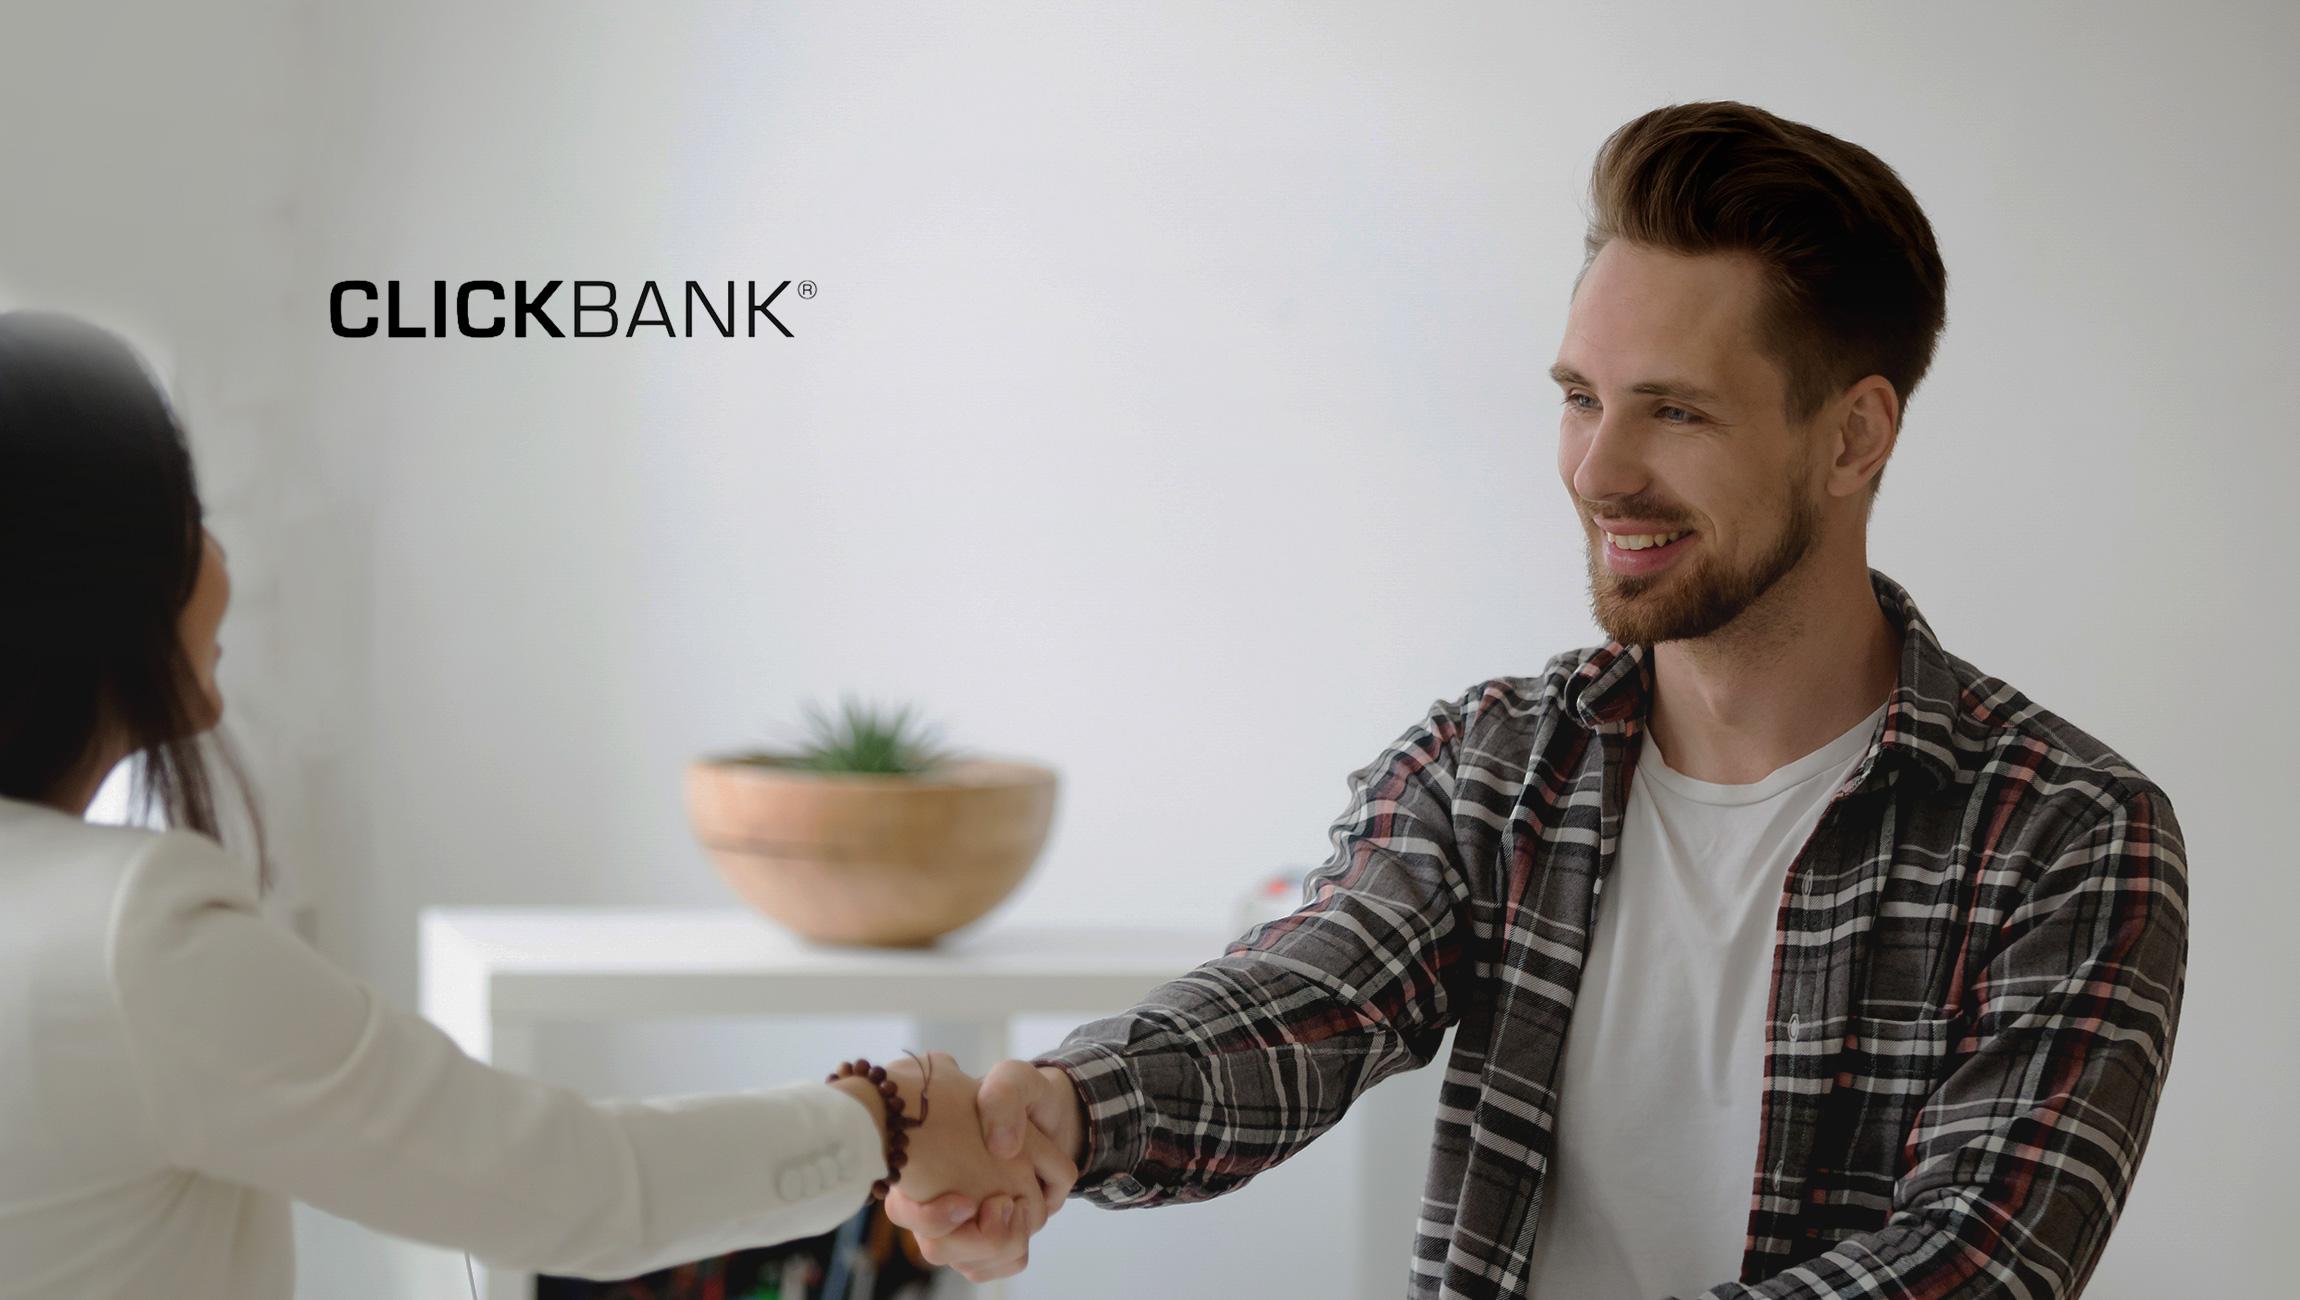 ClickBank Announces Partnership With Konnektive